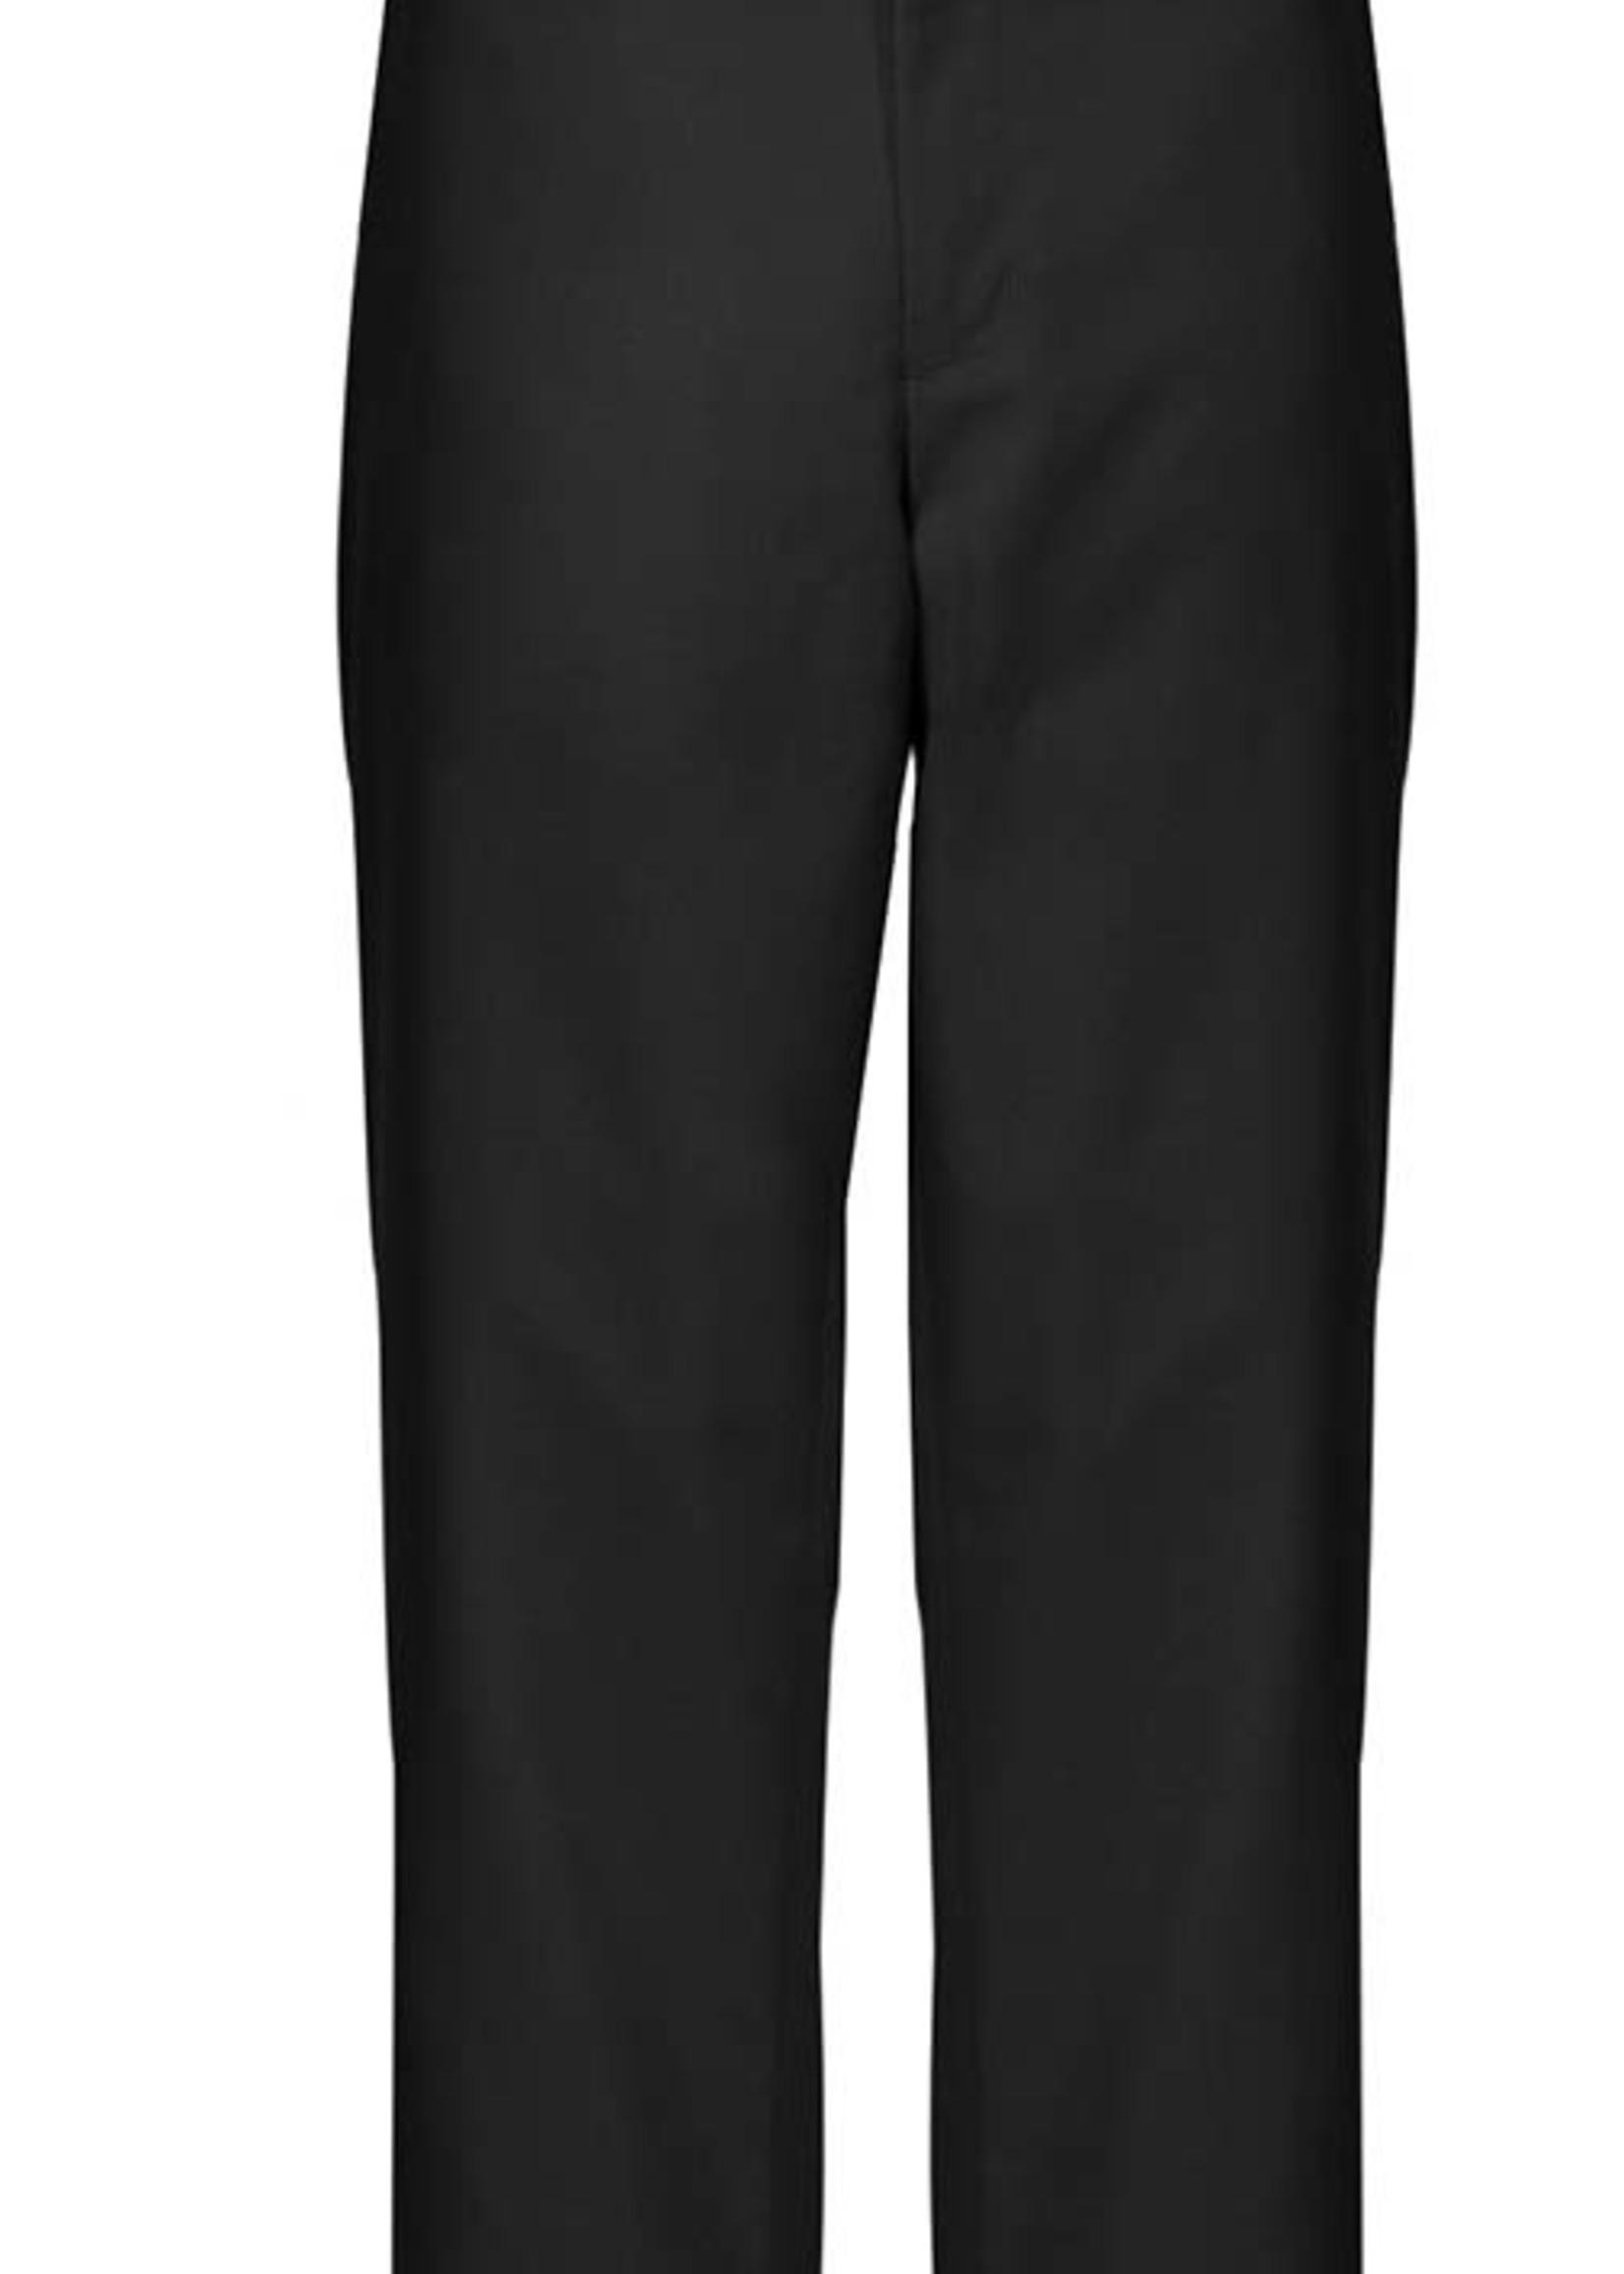 A+ Mens Flat Front Pants (BK)